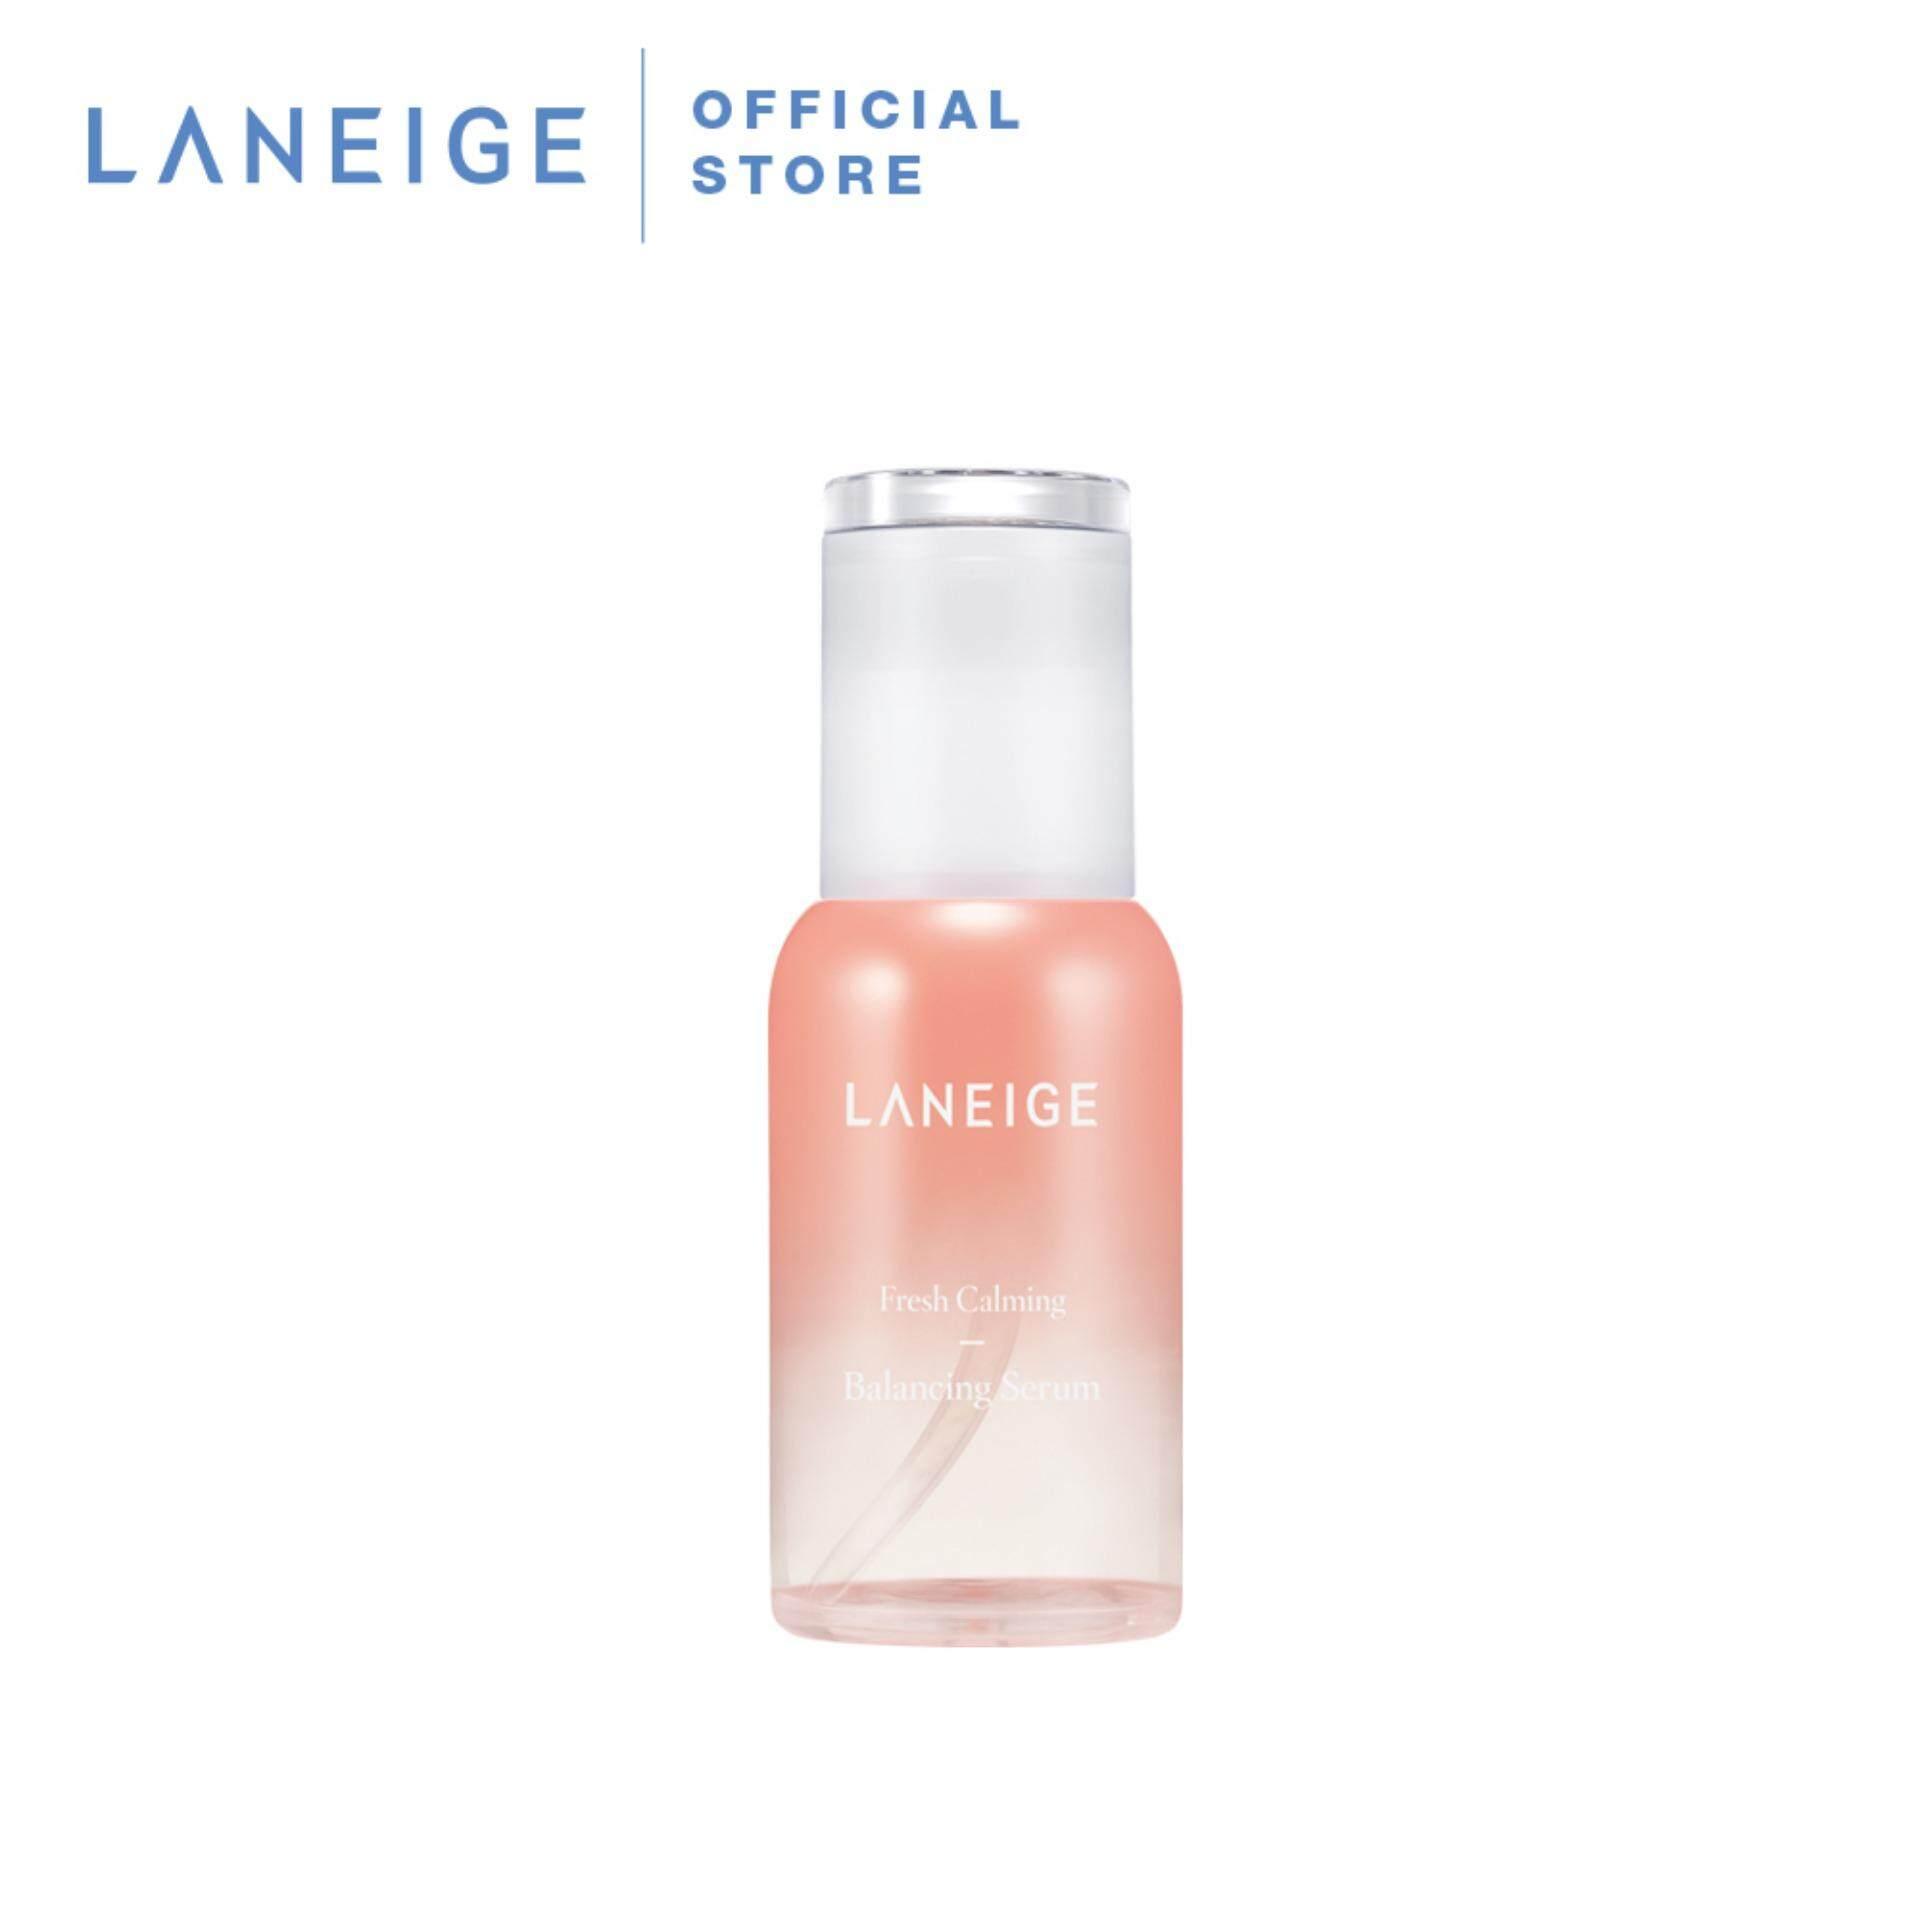 Review Of Laneige Malaysia Clear C Peeling Serum 80ml New Update Water Sleeping Mask Sampel 4ml Fresh Calming